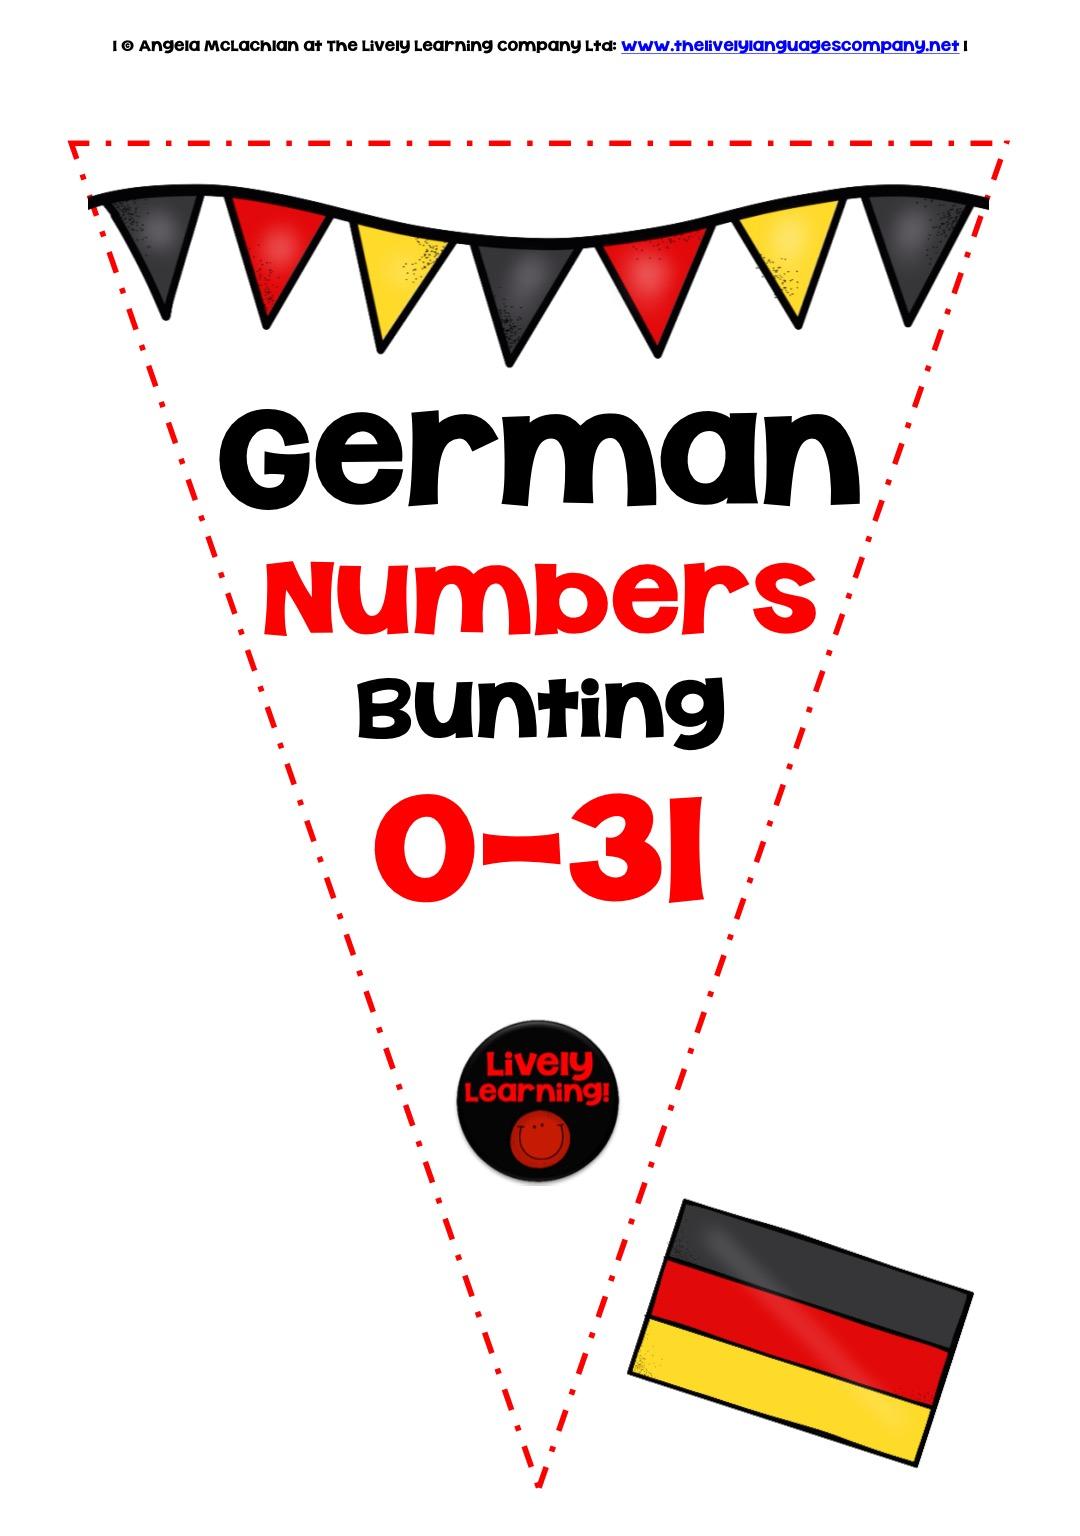 GERMAN NUMBERS 0-31 - BUNTING / BANNERS